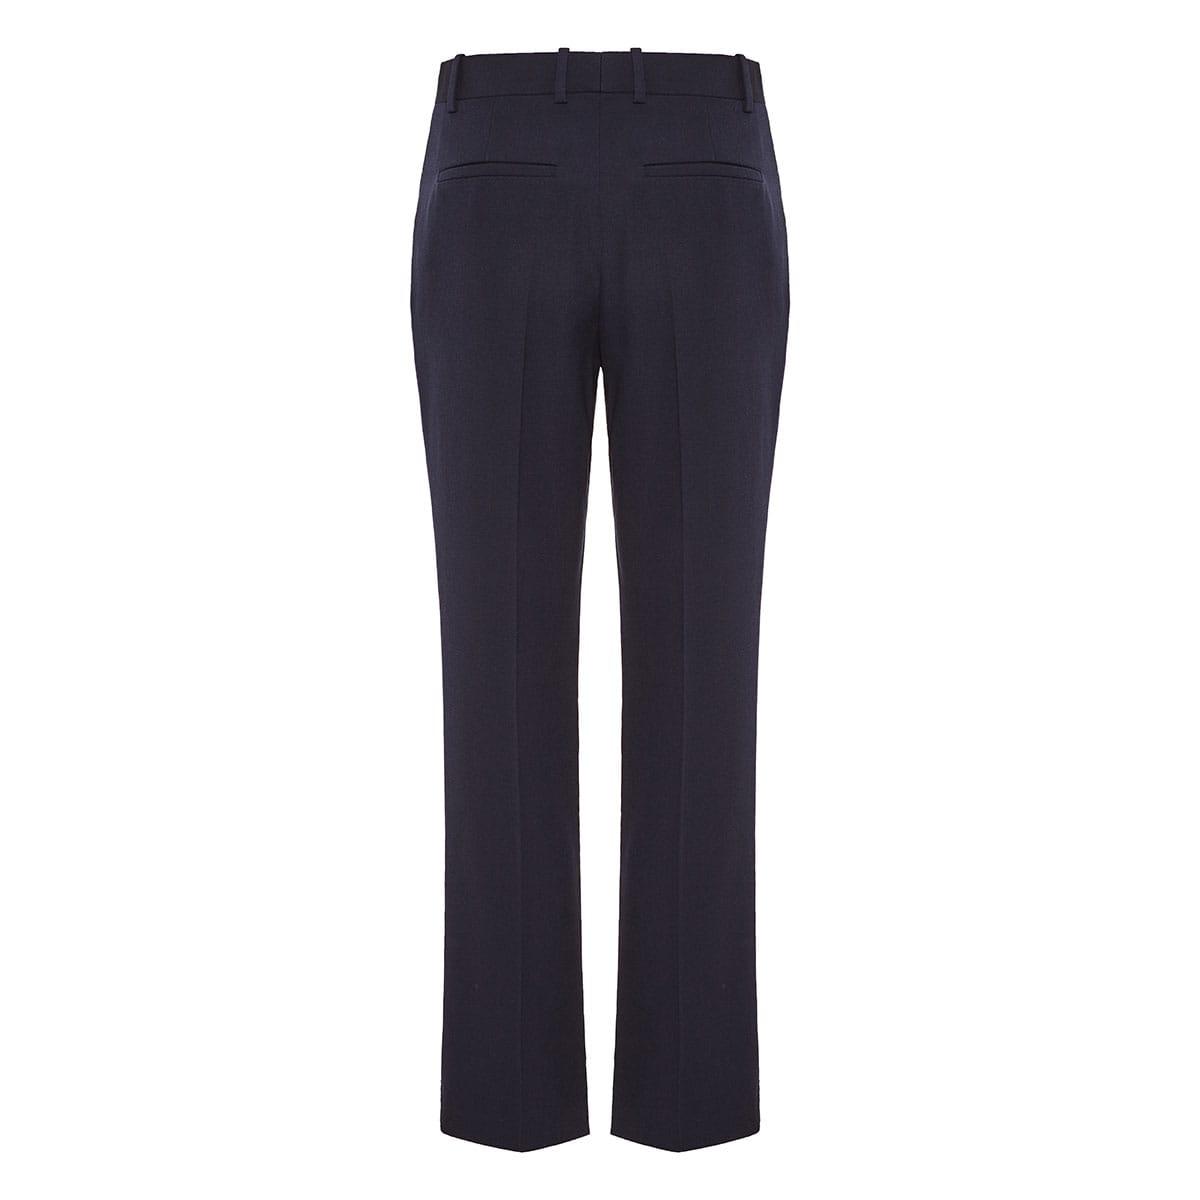 Cigarette wool trousers